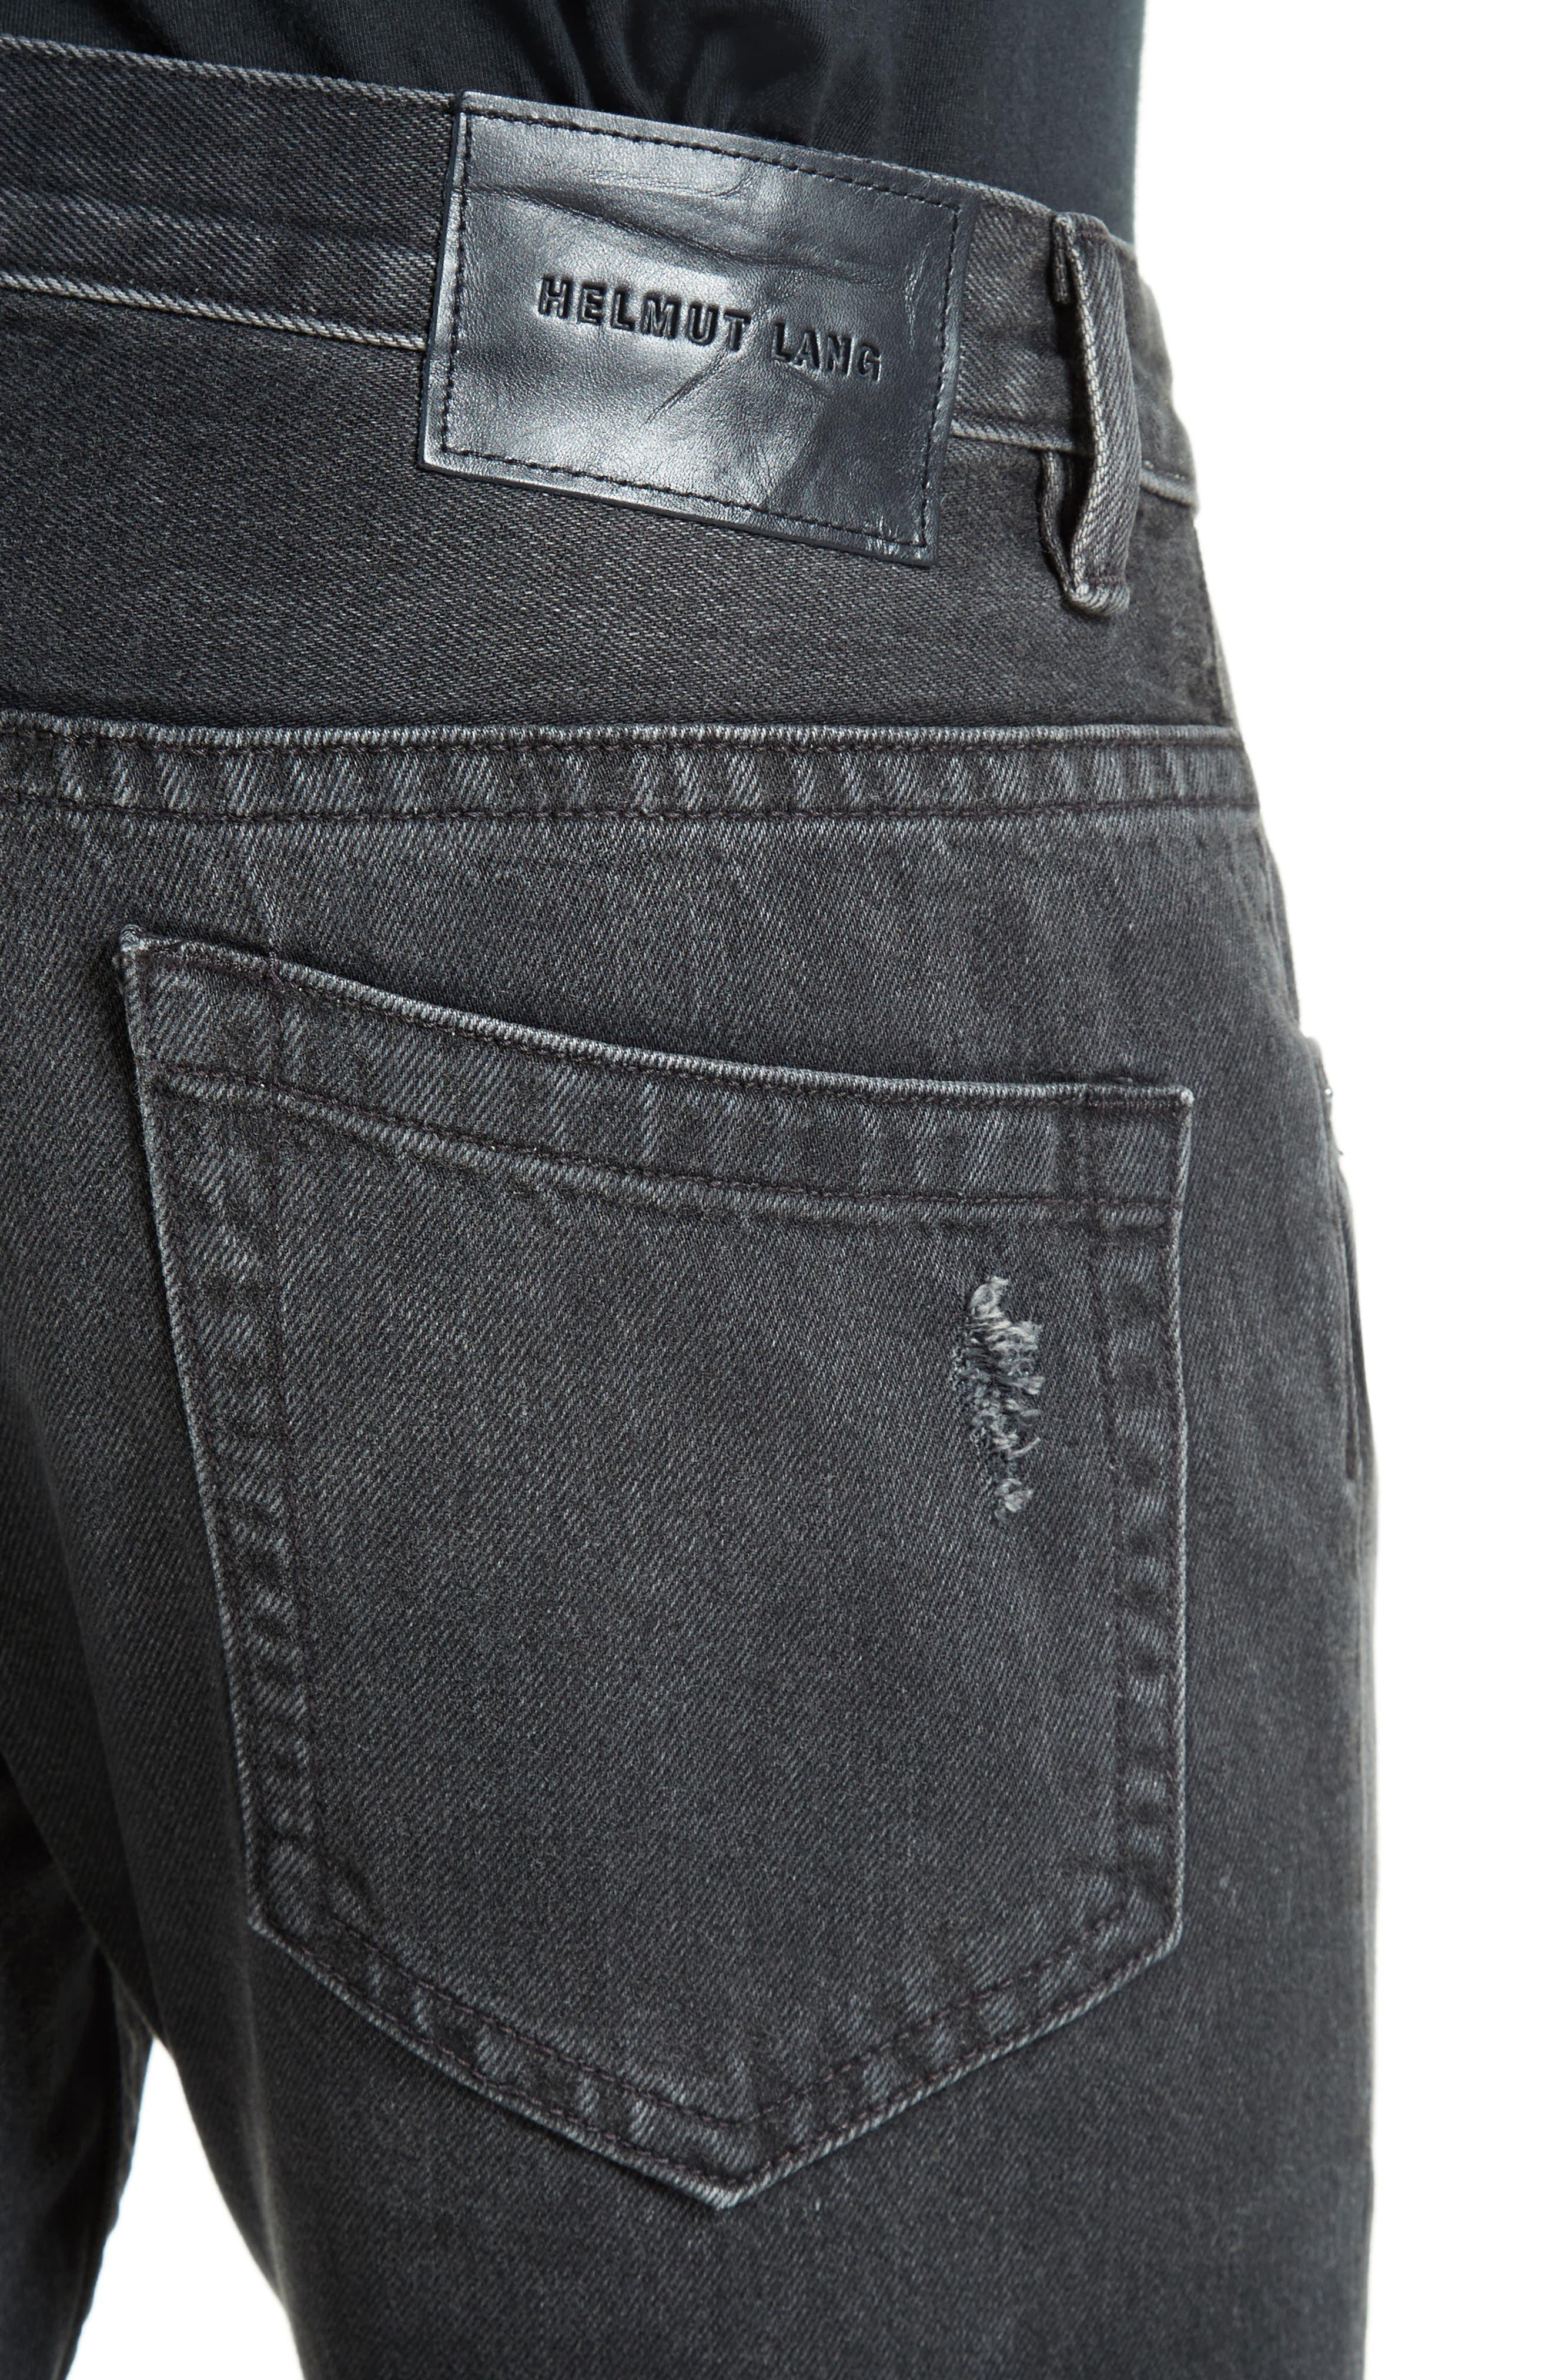 MR87 Destroyed Jeans,                             Alternate thumbnail 4, color,                             001